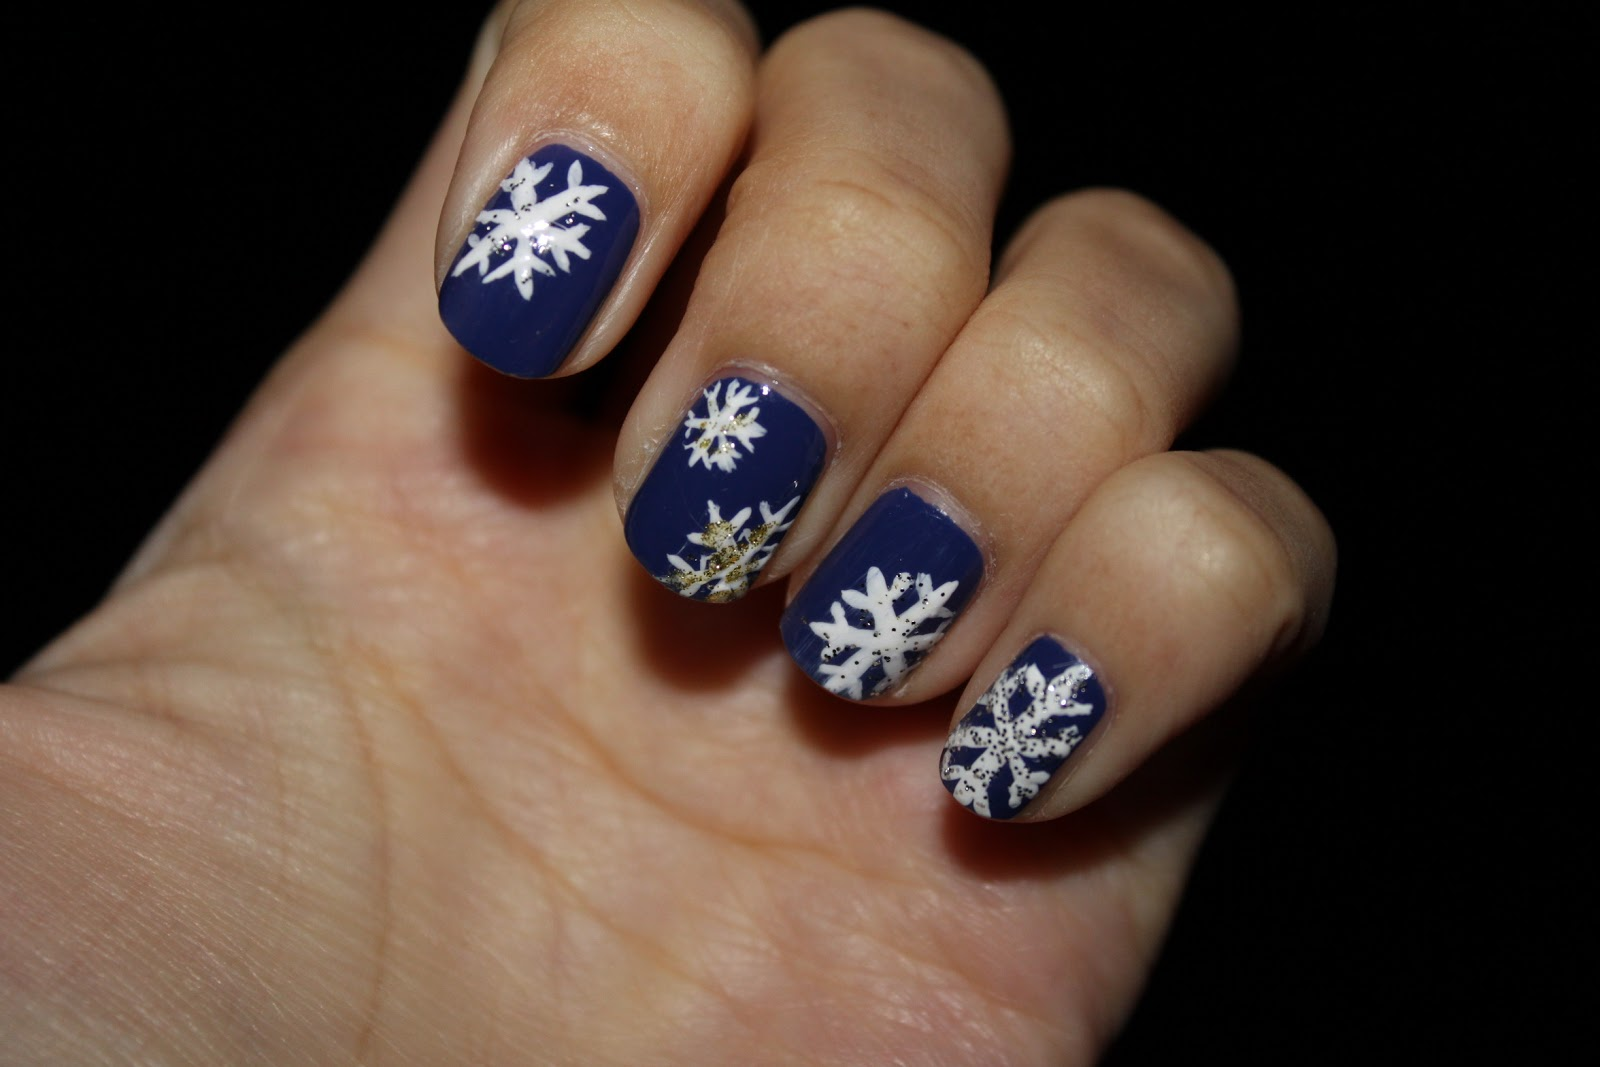 sara nail snowflakes nail art winter snow nail easy. Black Bedroom Furniture Sets. Home Design Ideas